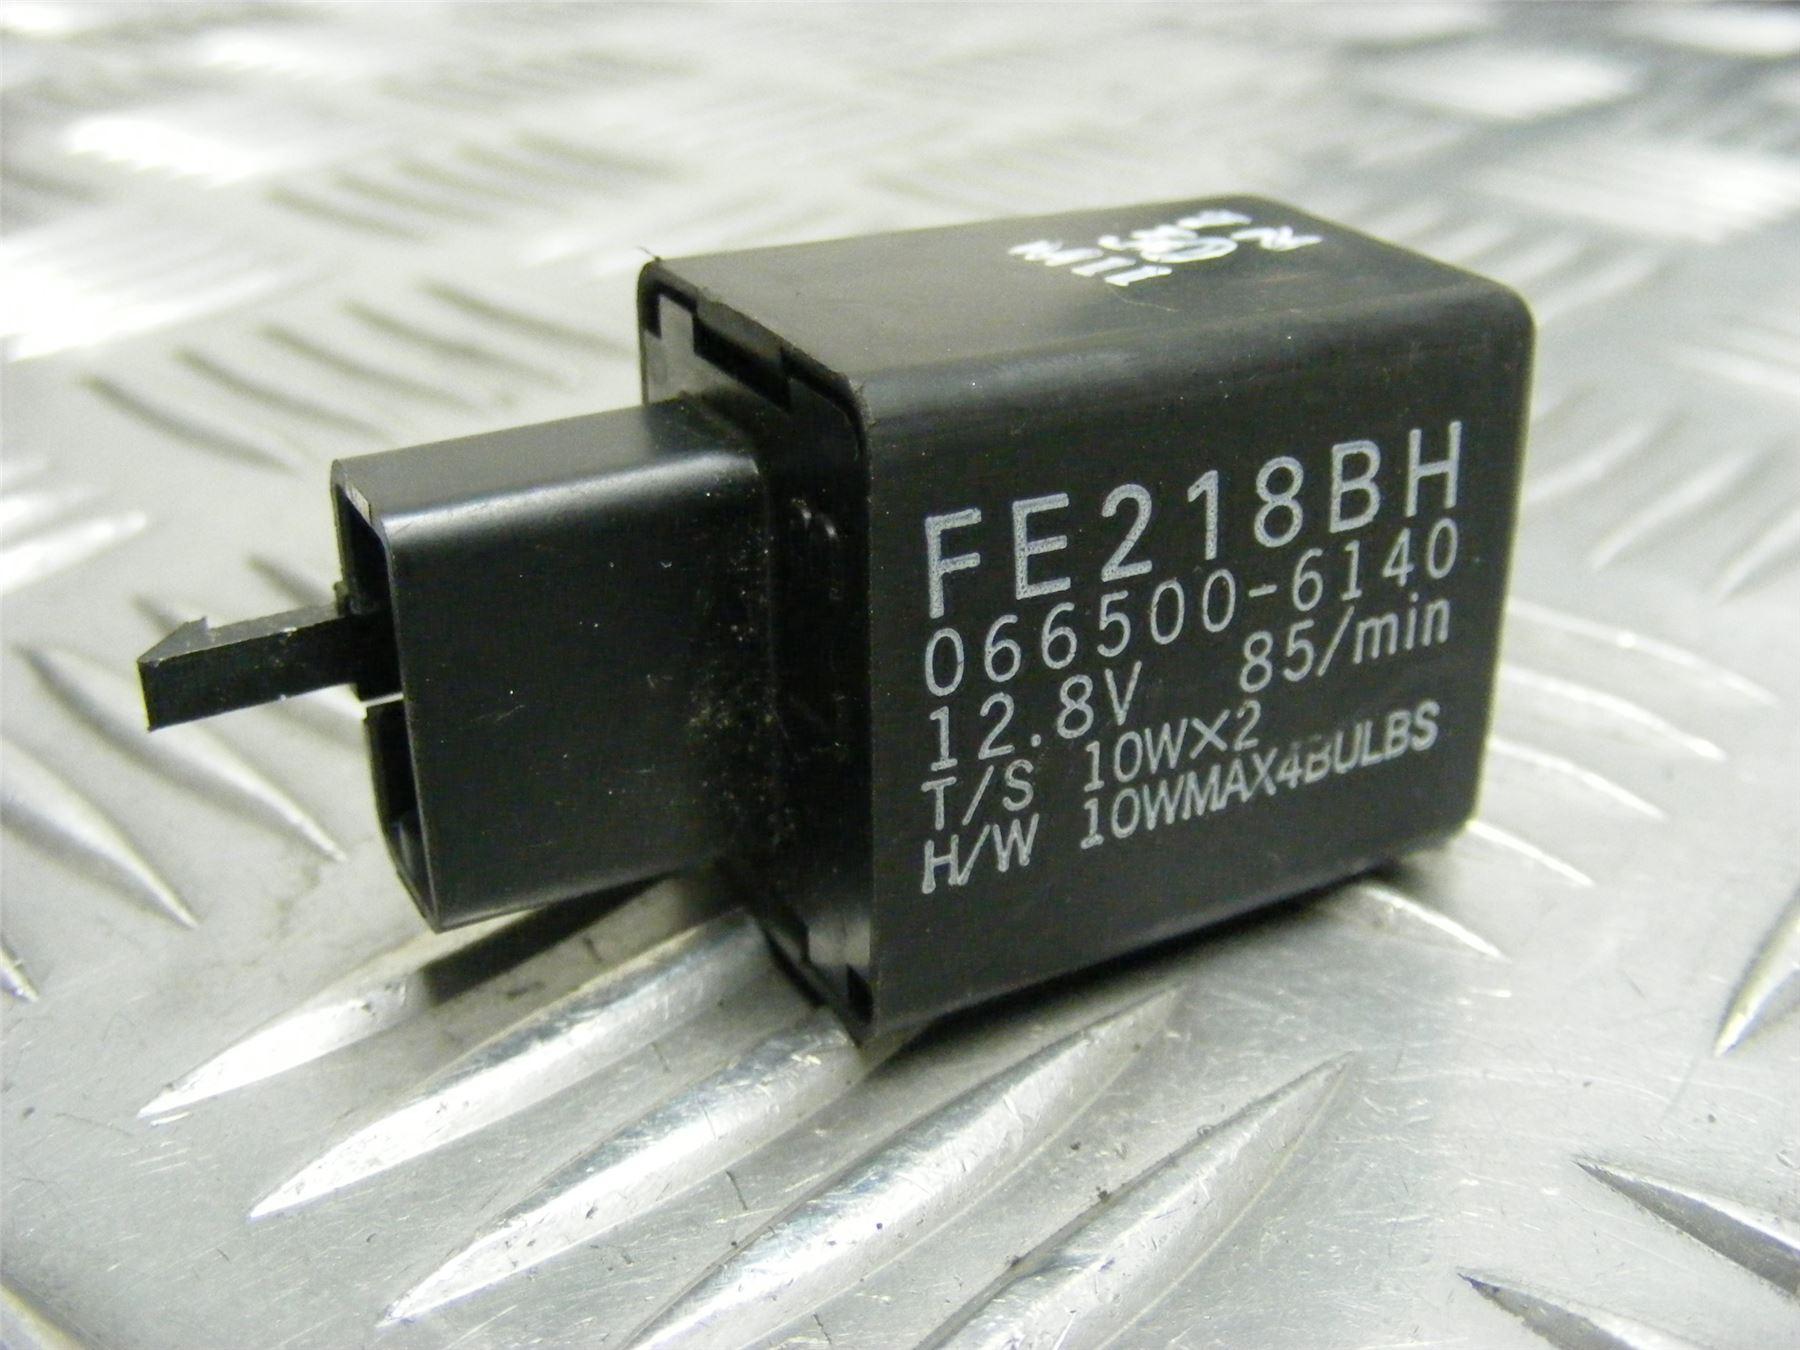 Kawasaki Z1000sx Z1000 Sx 2012 Indicator Relay 142 Ebay Lighting System Circuit